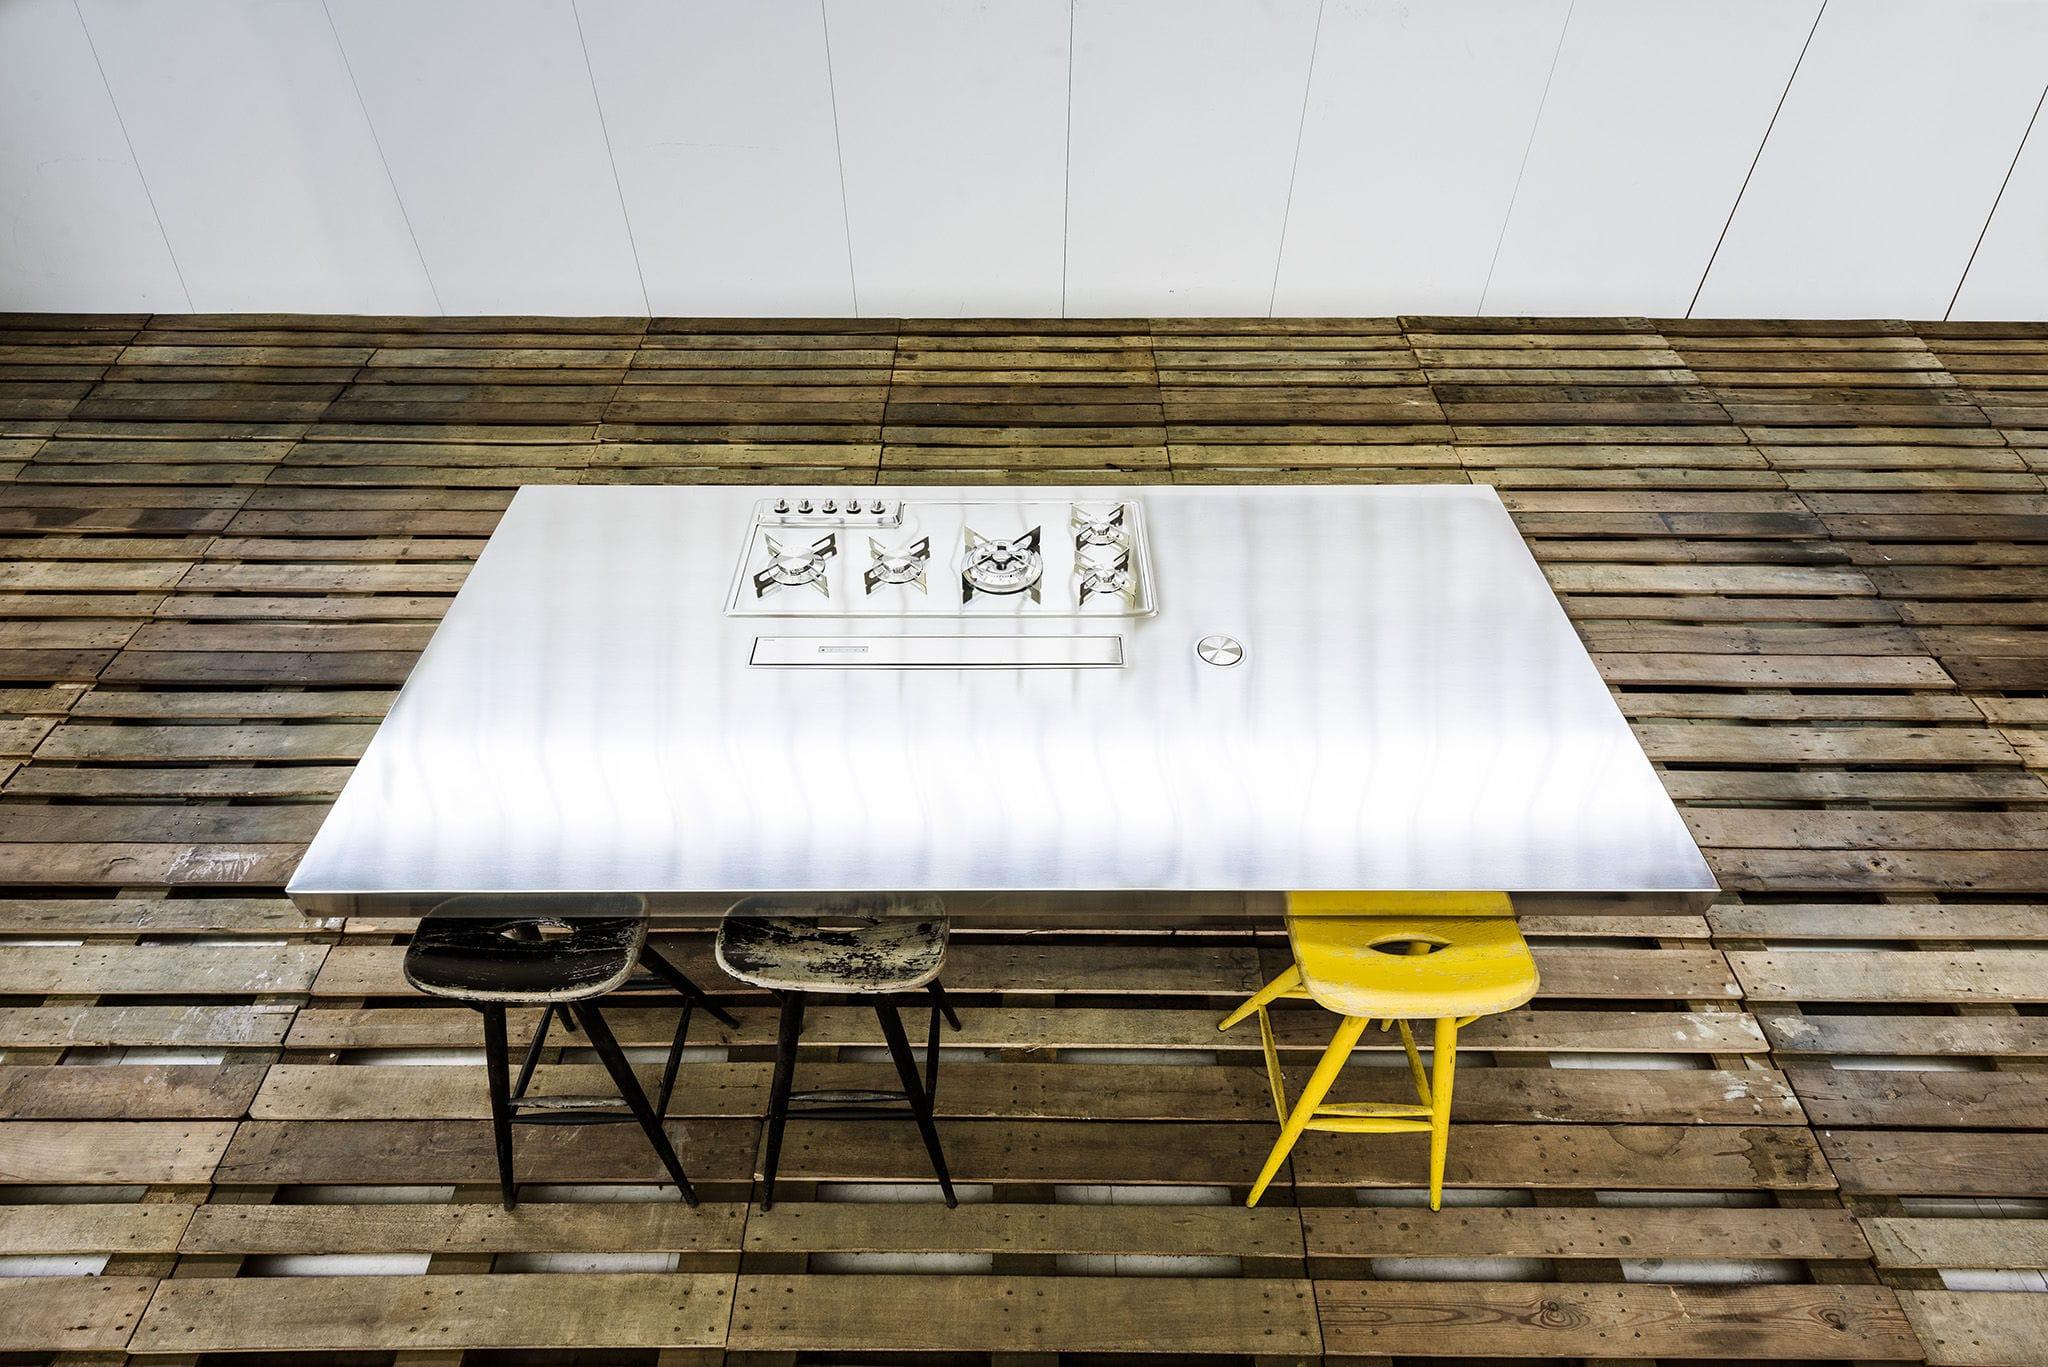 Kücheninsel - 250 WITH BUILT-IN EXTRACTOR HOOD - ALPES-INOX